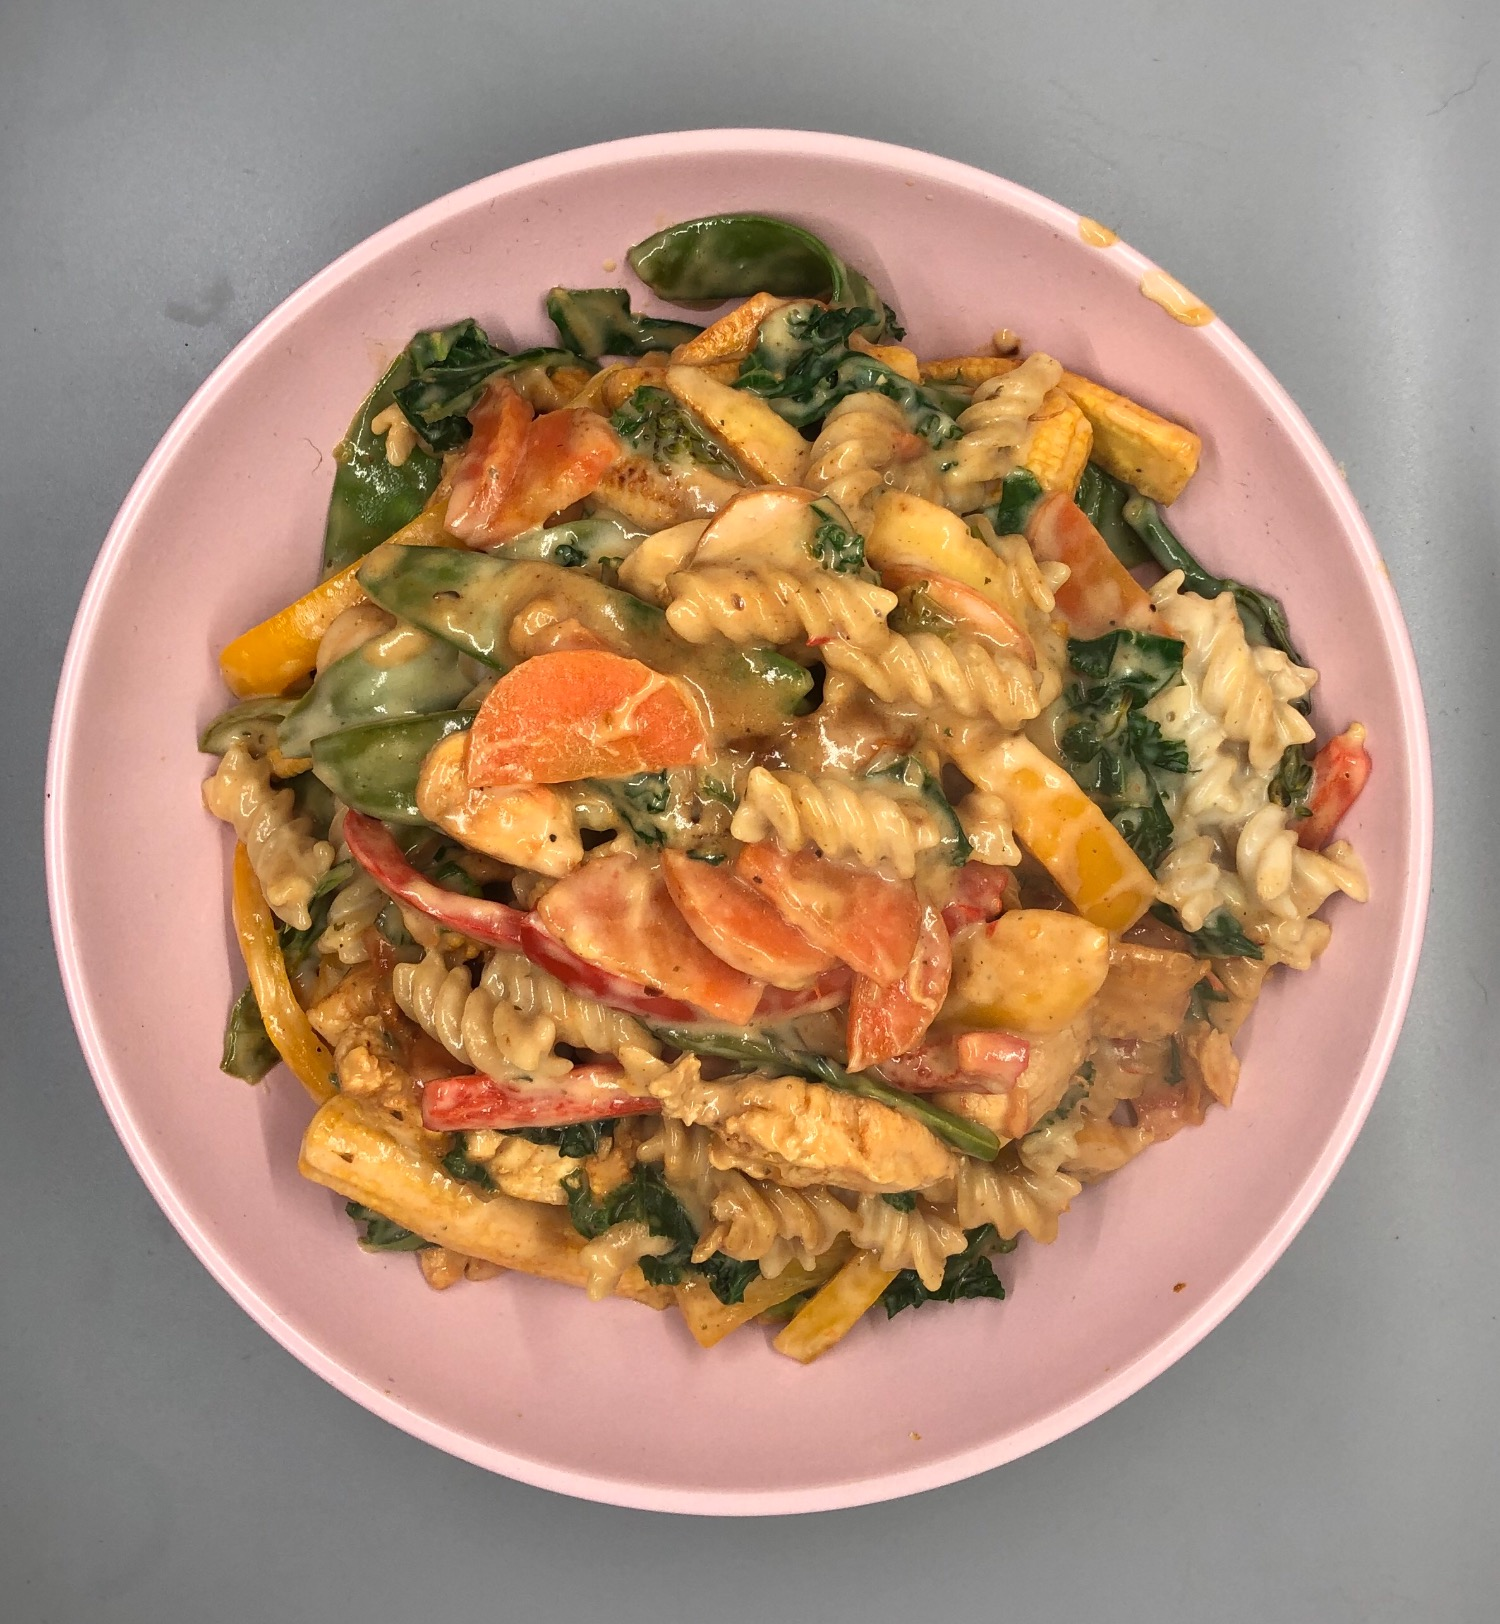 Cream Cajun chicken and veg pasta